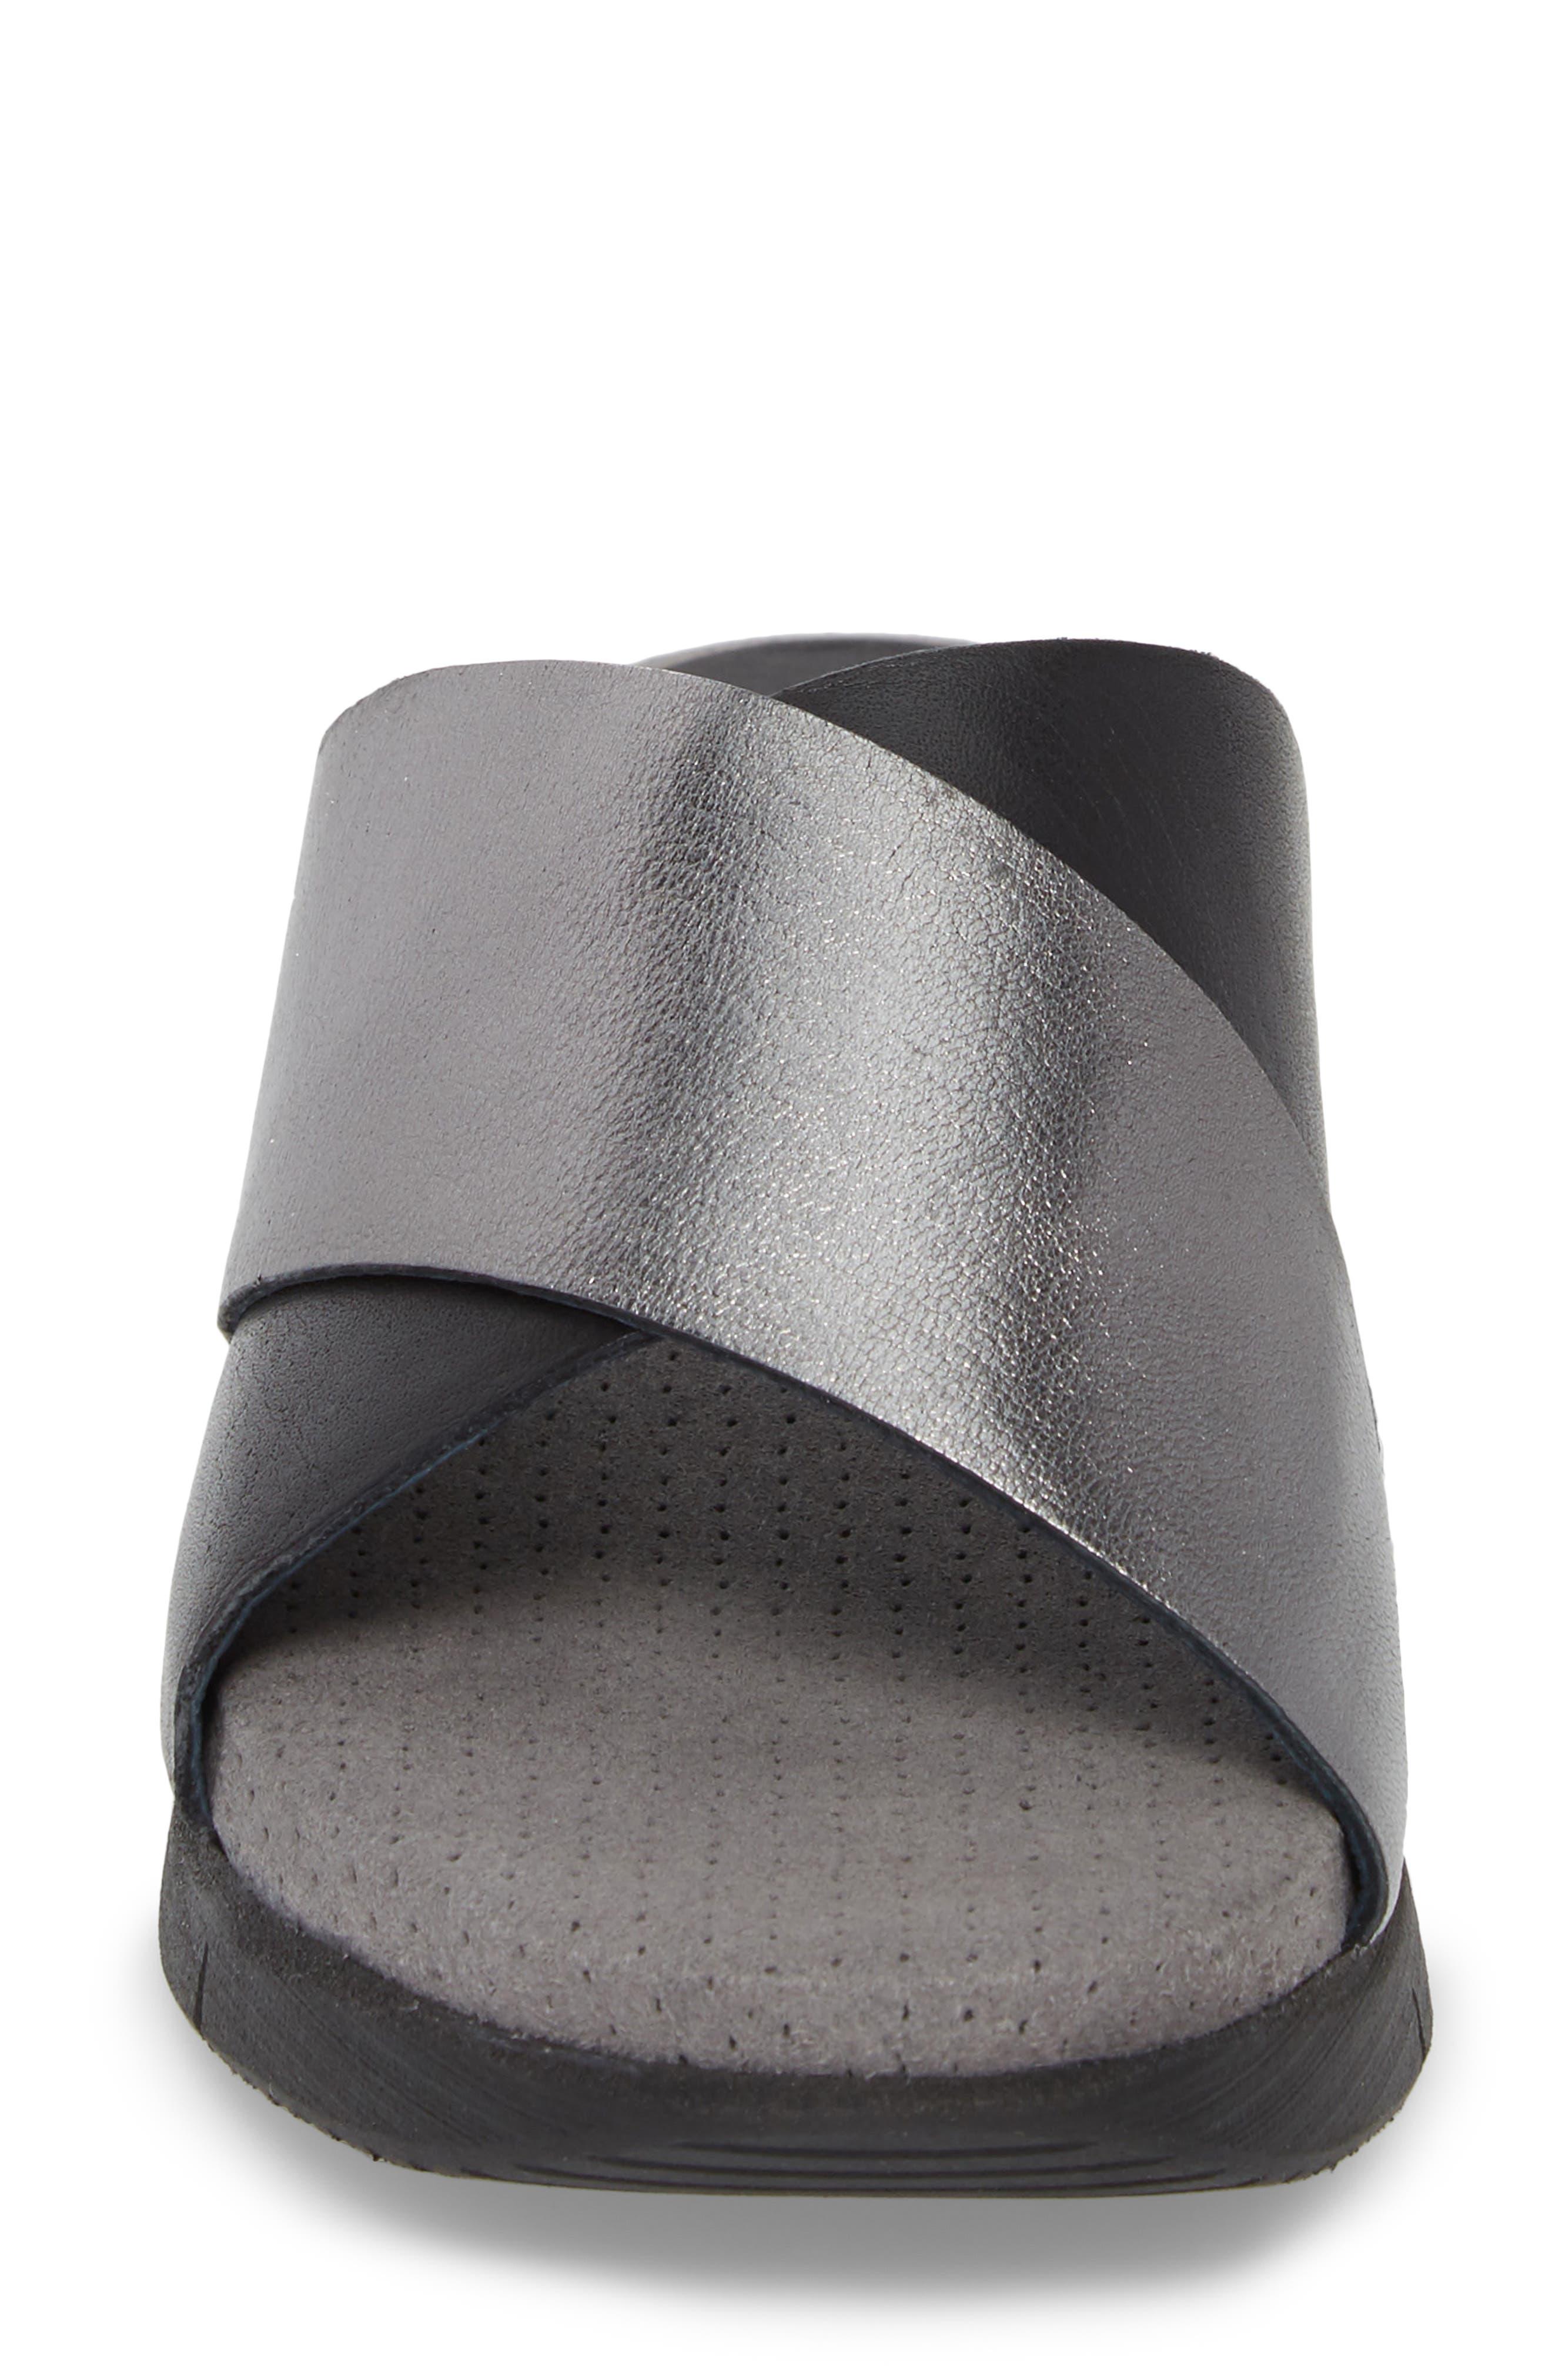 BOS. & CO., Piney Slide Sandal, Alternate thumbnail 4, color, BLACK/ PEWTER LEATHER